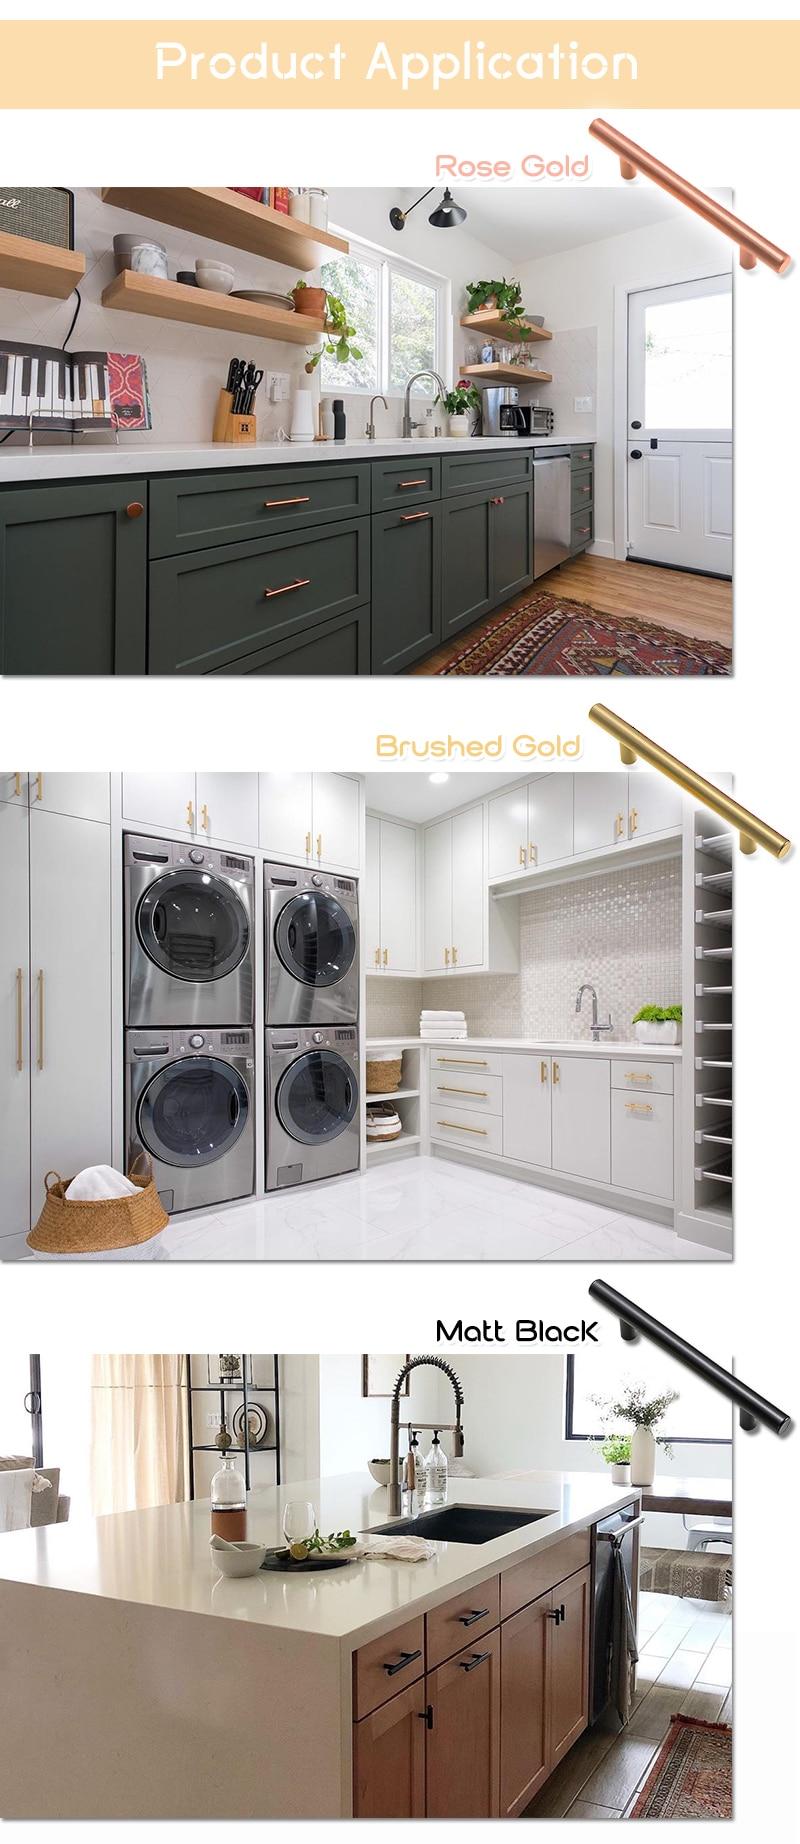 Uke Modern Furniture Handles Cabinet Drawer Wardrobe Handles Kitchen Cupboard Door Handles Rose Gold Brushed Brass Black Solid Aliexpress